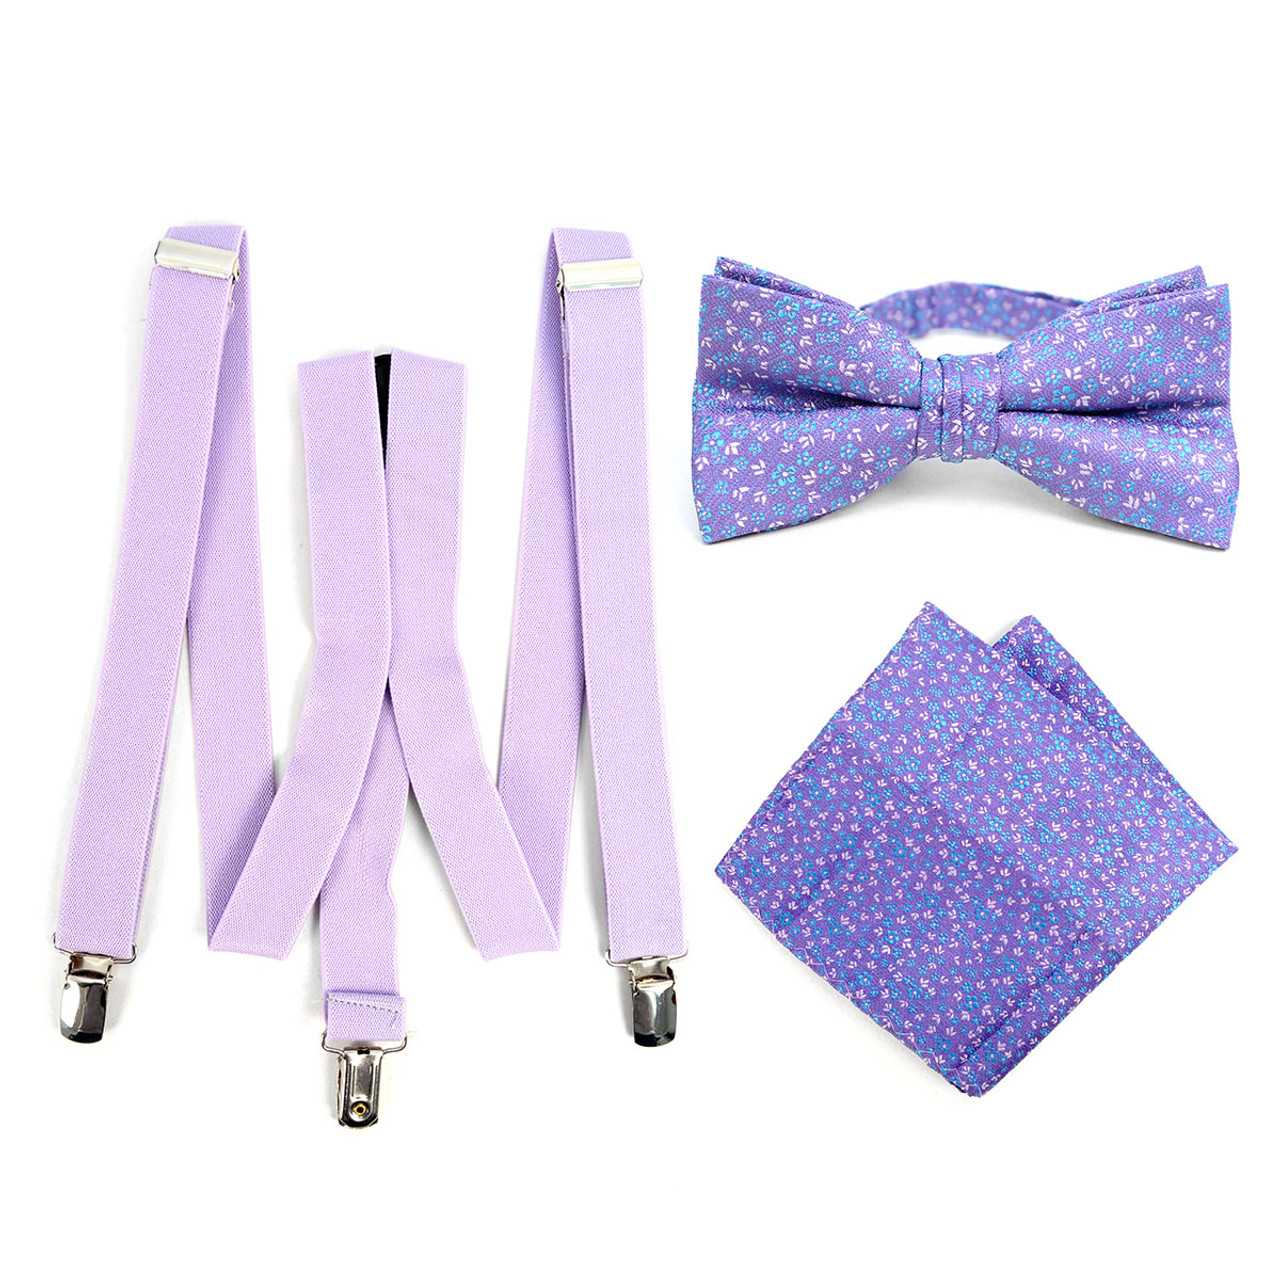 99d1a2f0c3fc 3pc Men's Lavender Clip-on Suspenders, Floral Bow Tie & Hanky Sets -  FYBTHSU-LAV#1